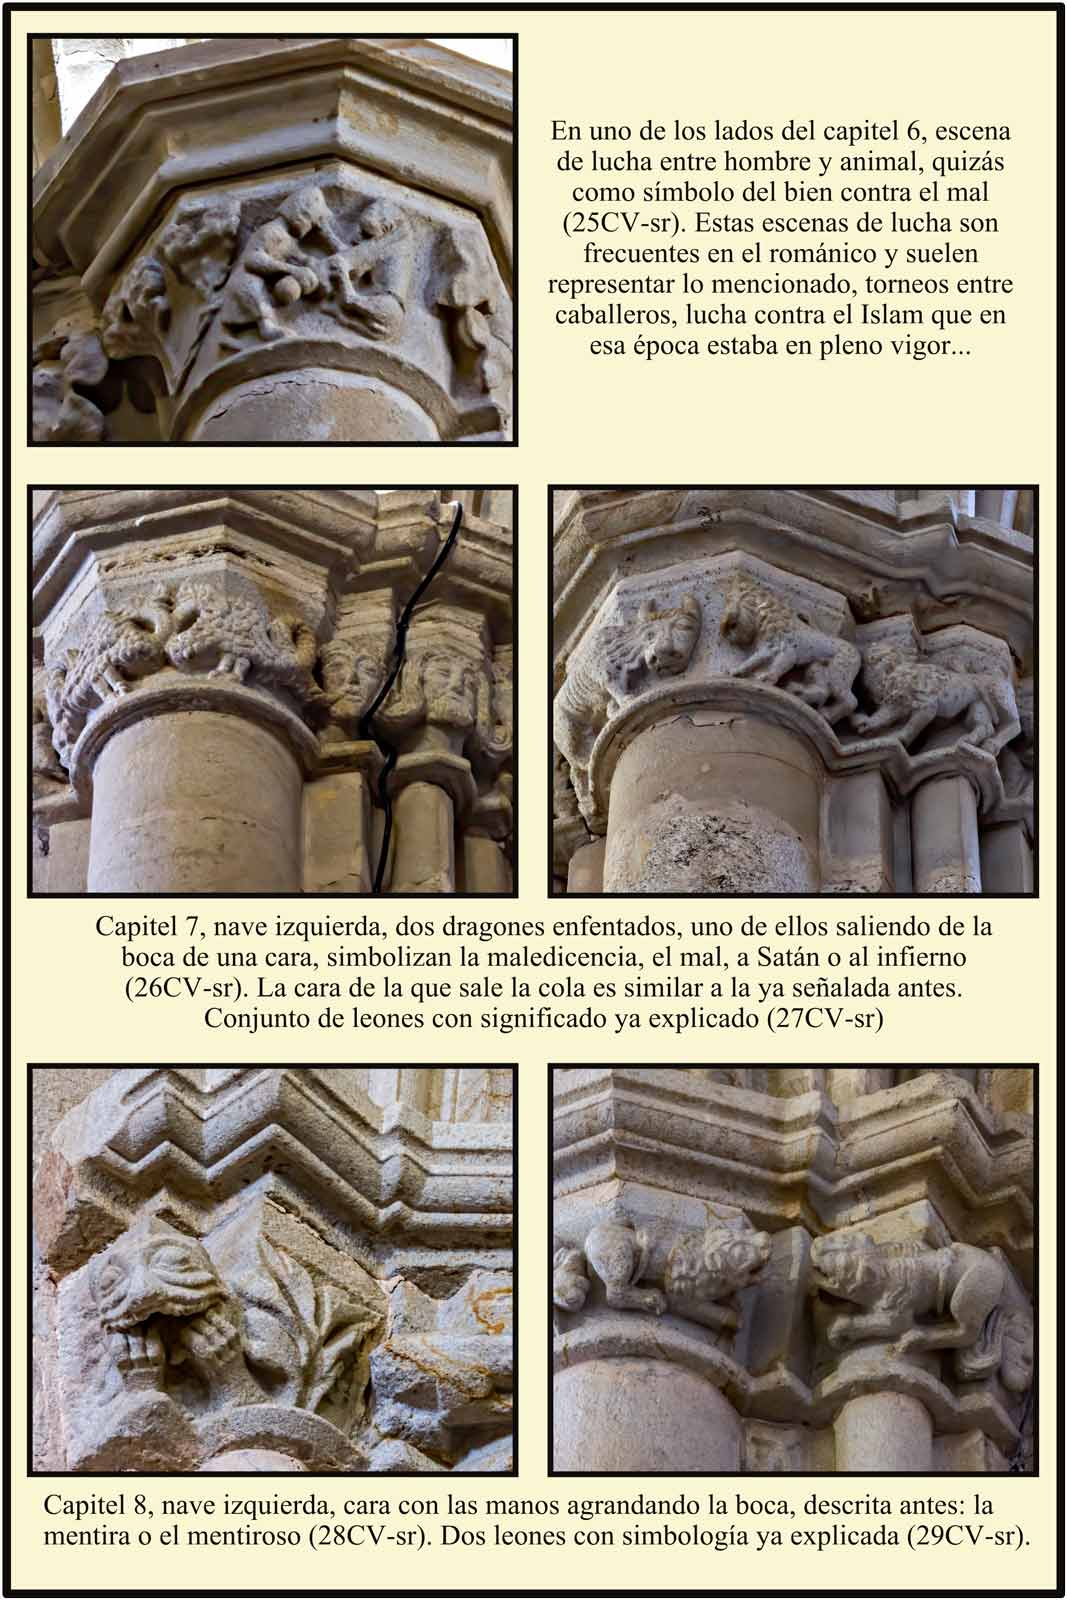 Animales caras escena lucha capitel romanico